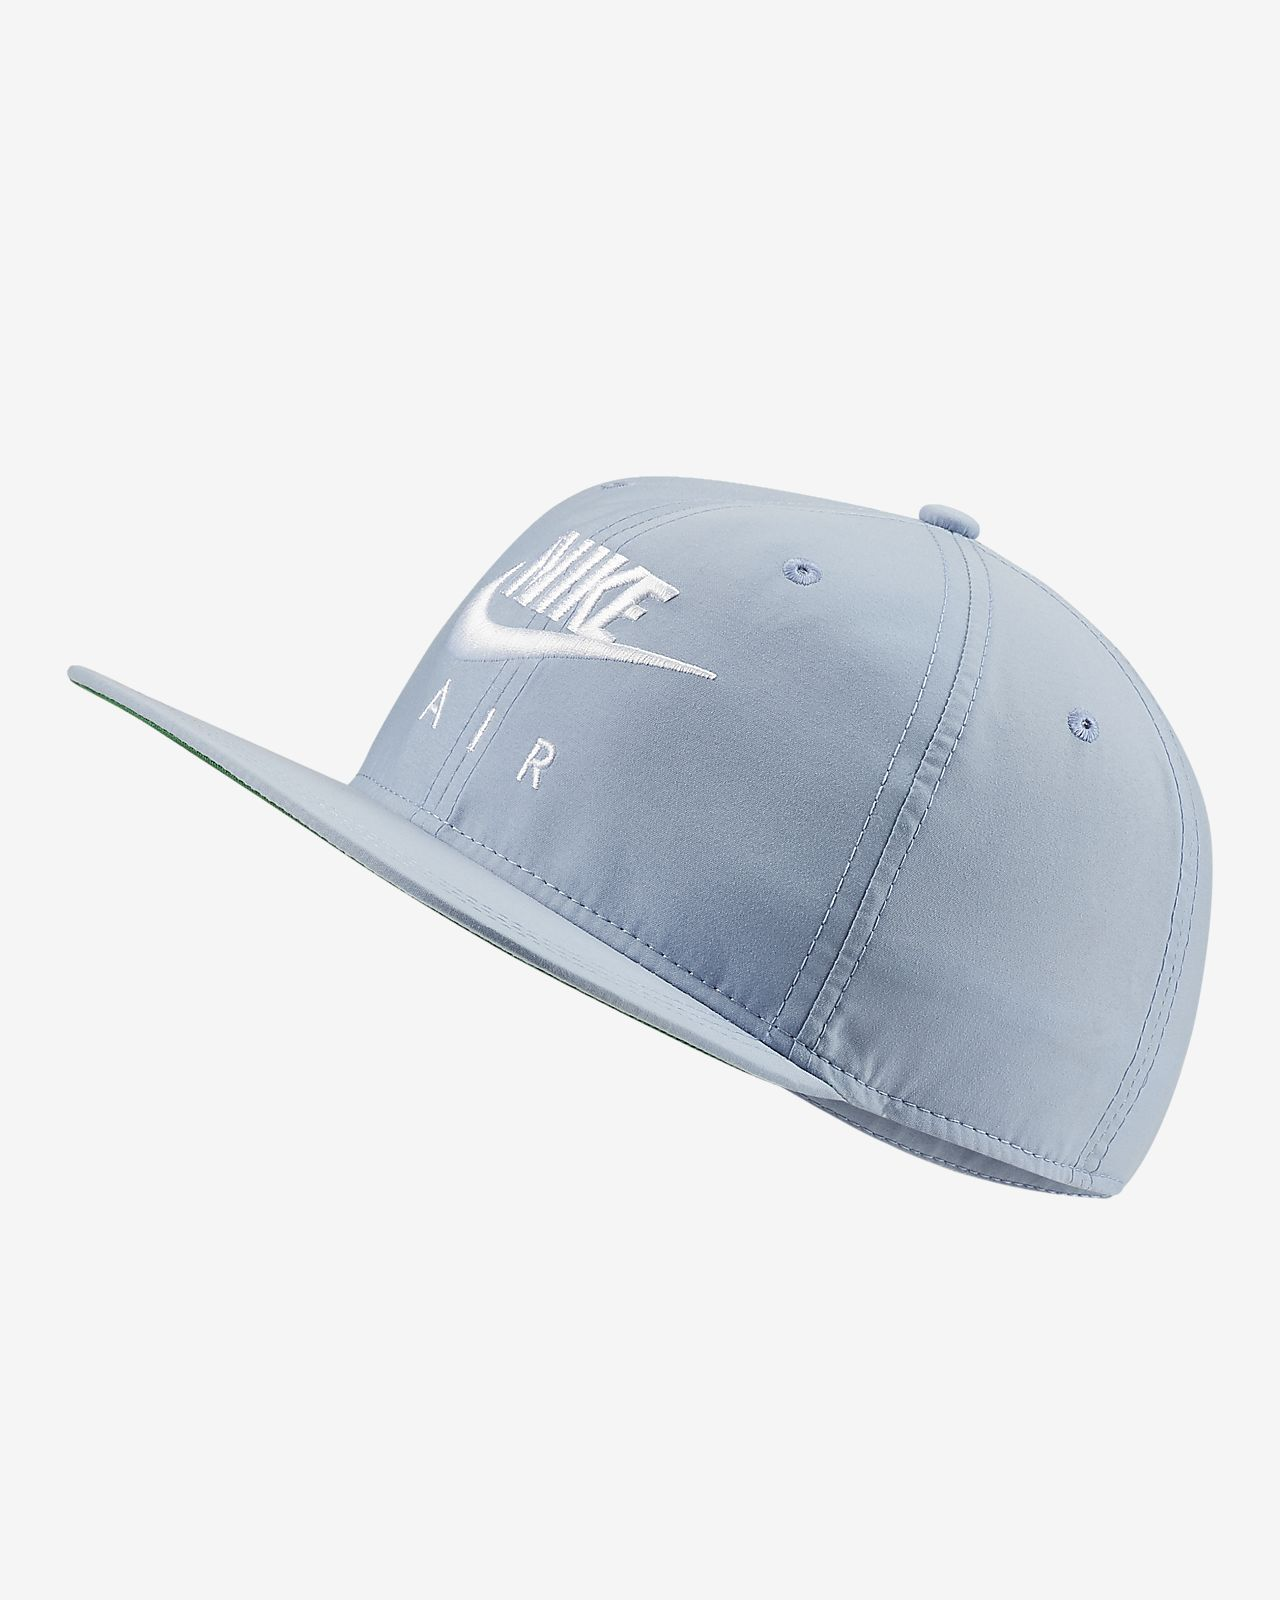 Nike Air Pro Ayarlanabilir Şapka